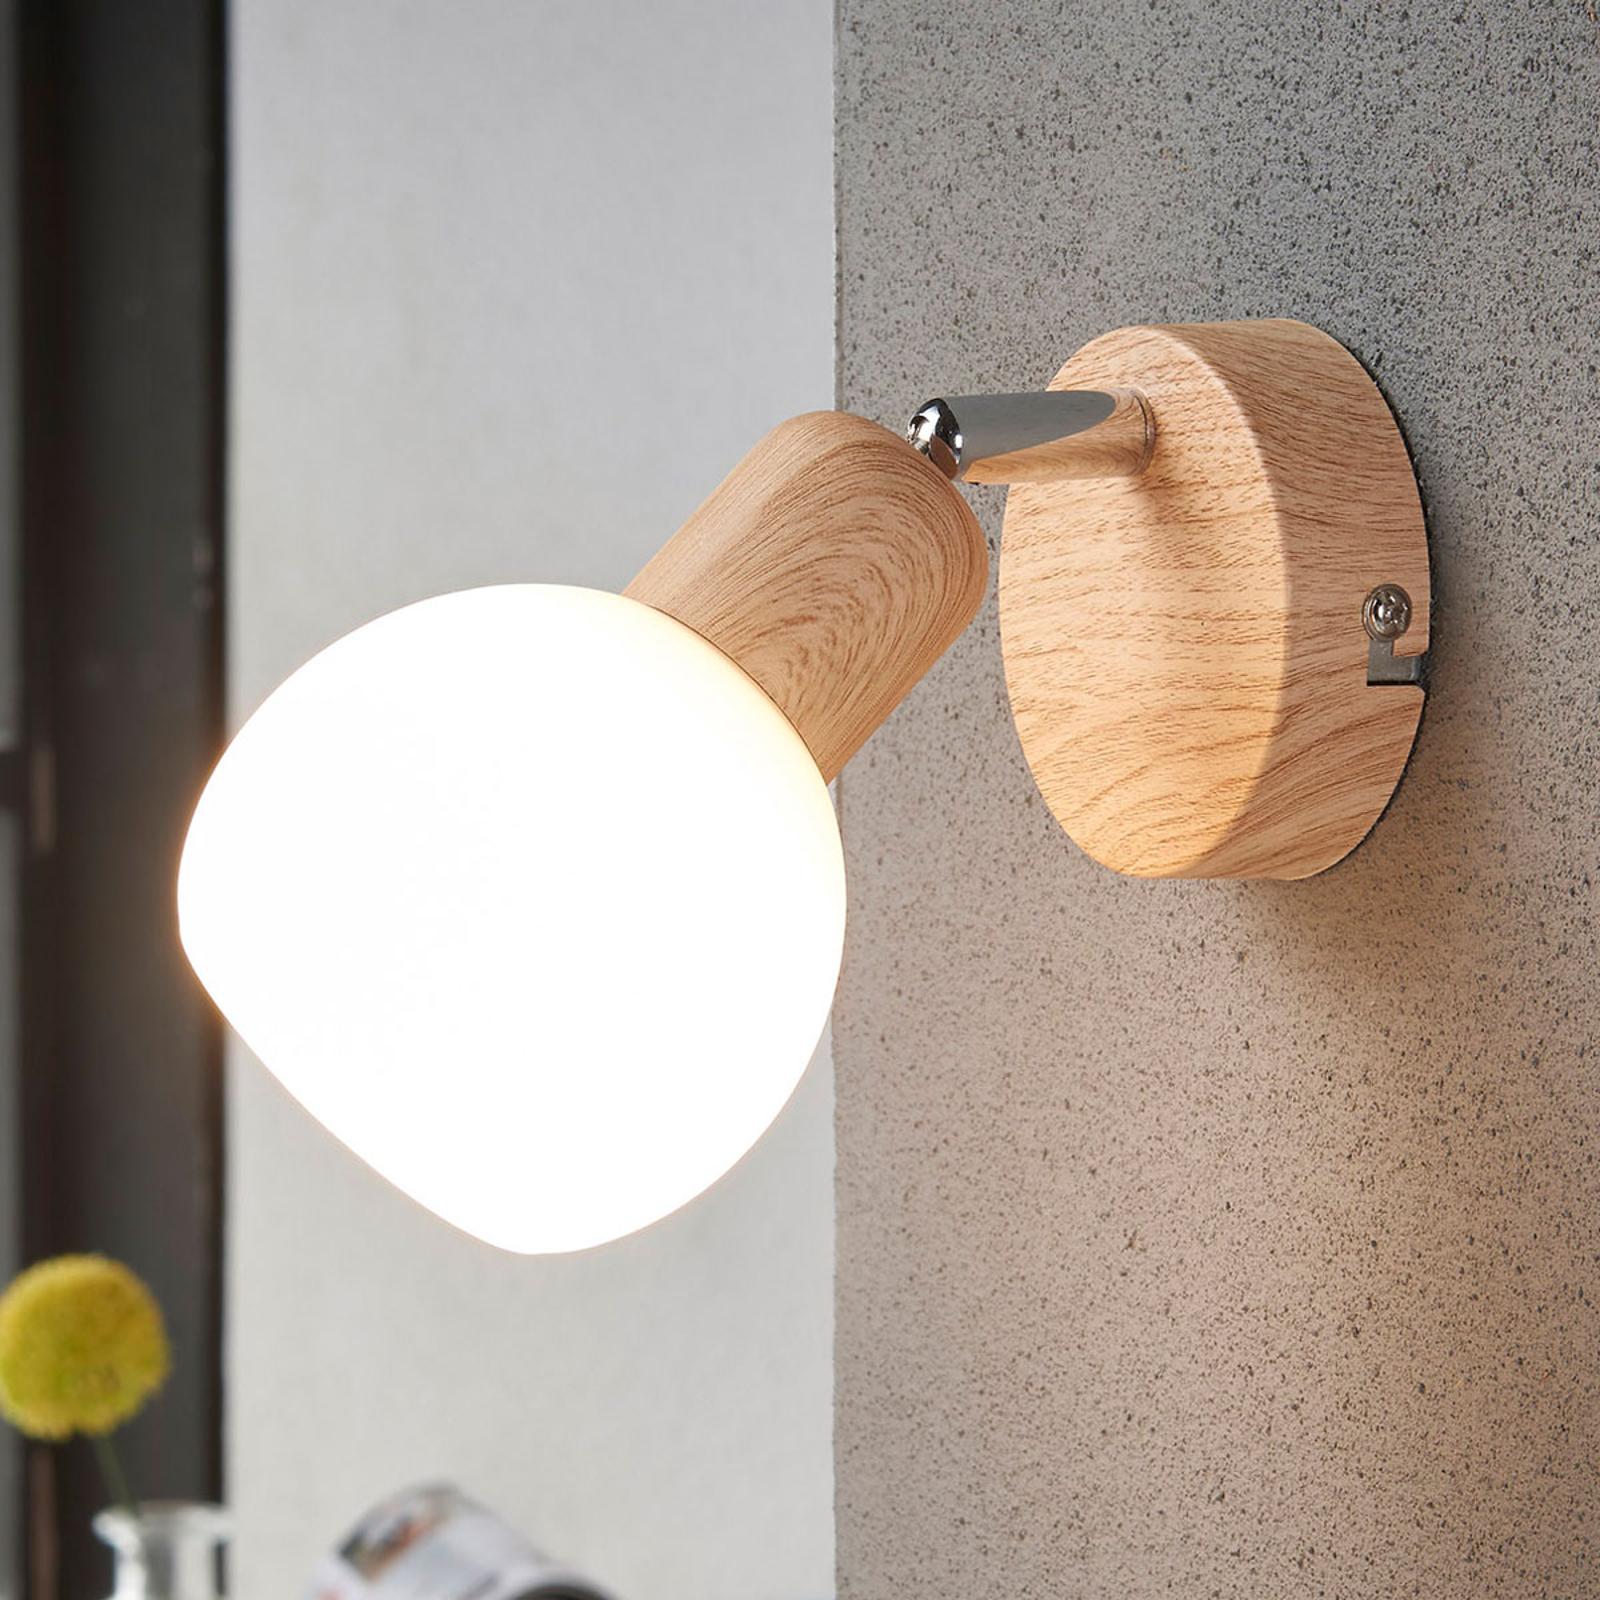 Foco LED Svenka de 1 llama, efecto madera